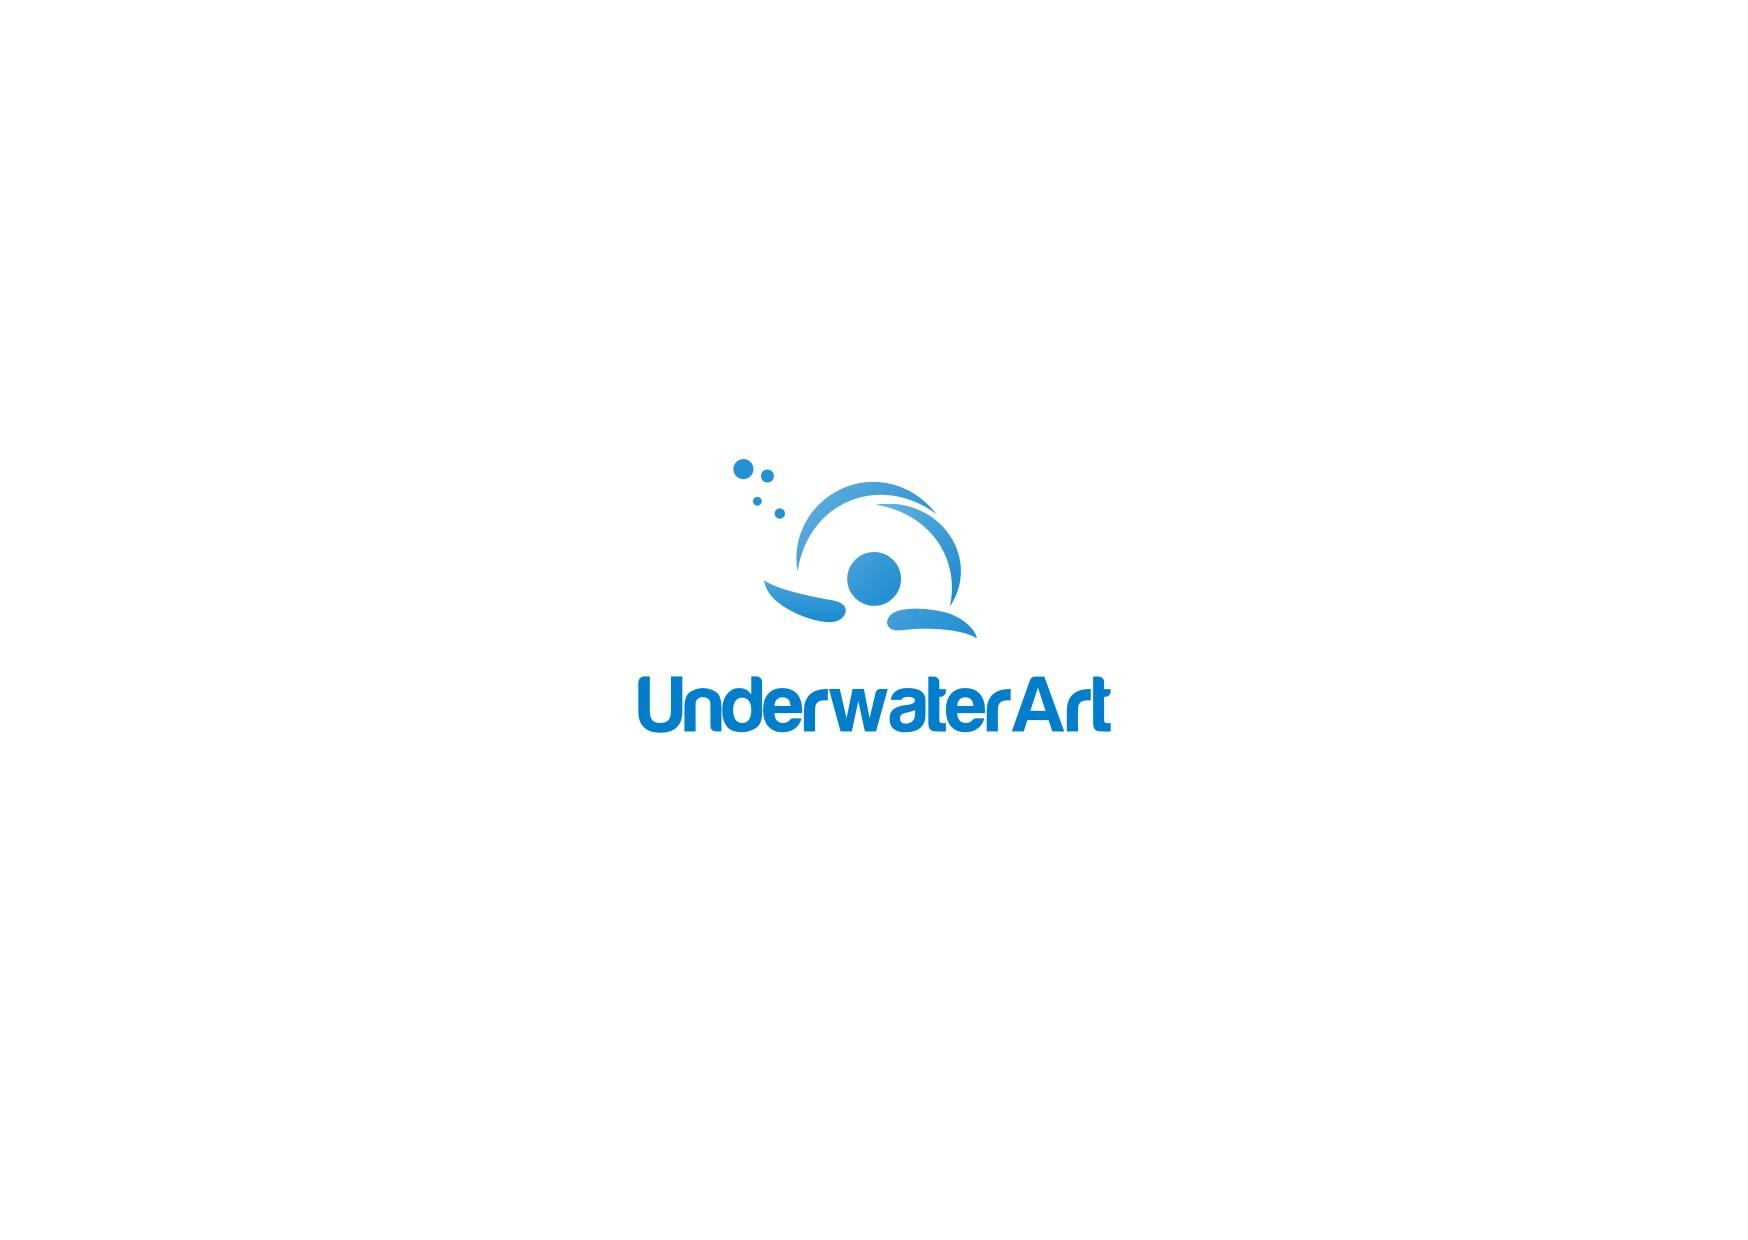 Create the next logo for Underwater Art